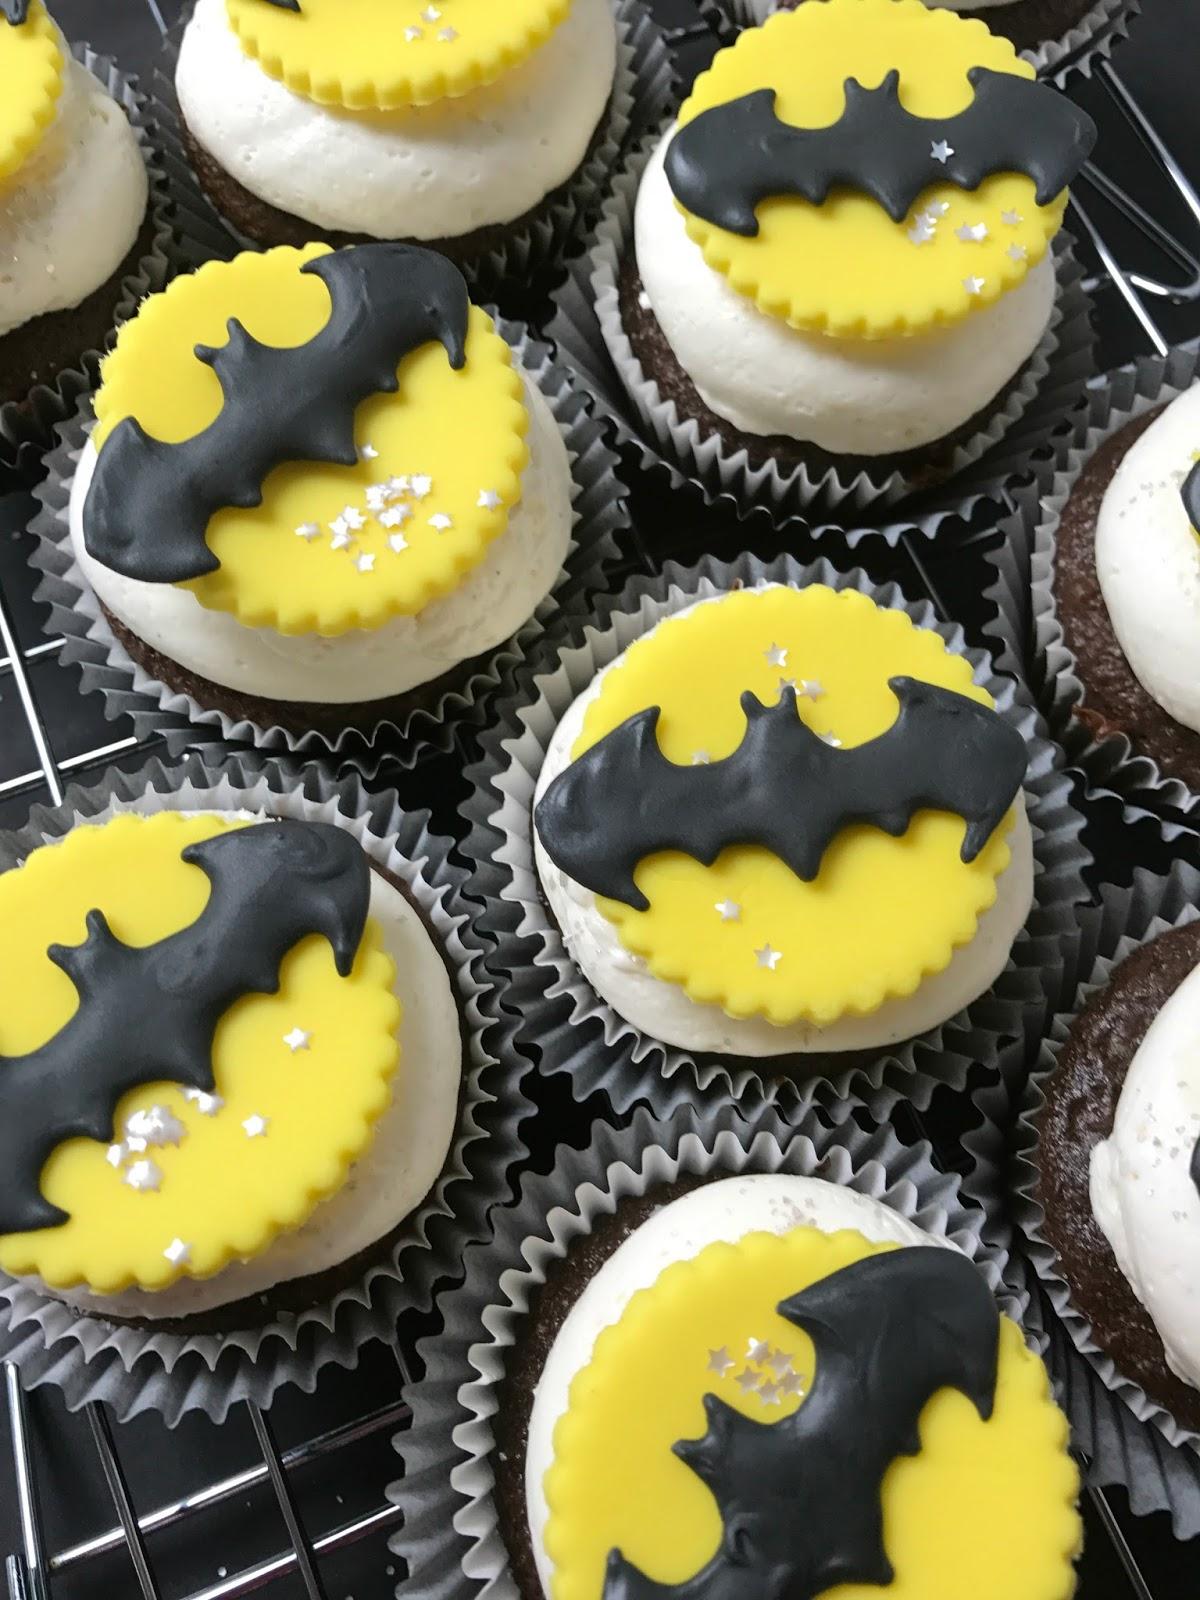 Easy Fondant Decorated Batman Cupcakes Sweet Jenny Belle